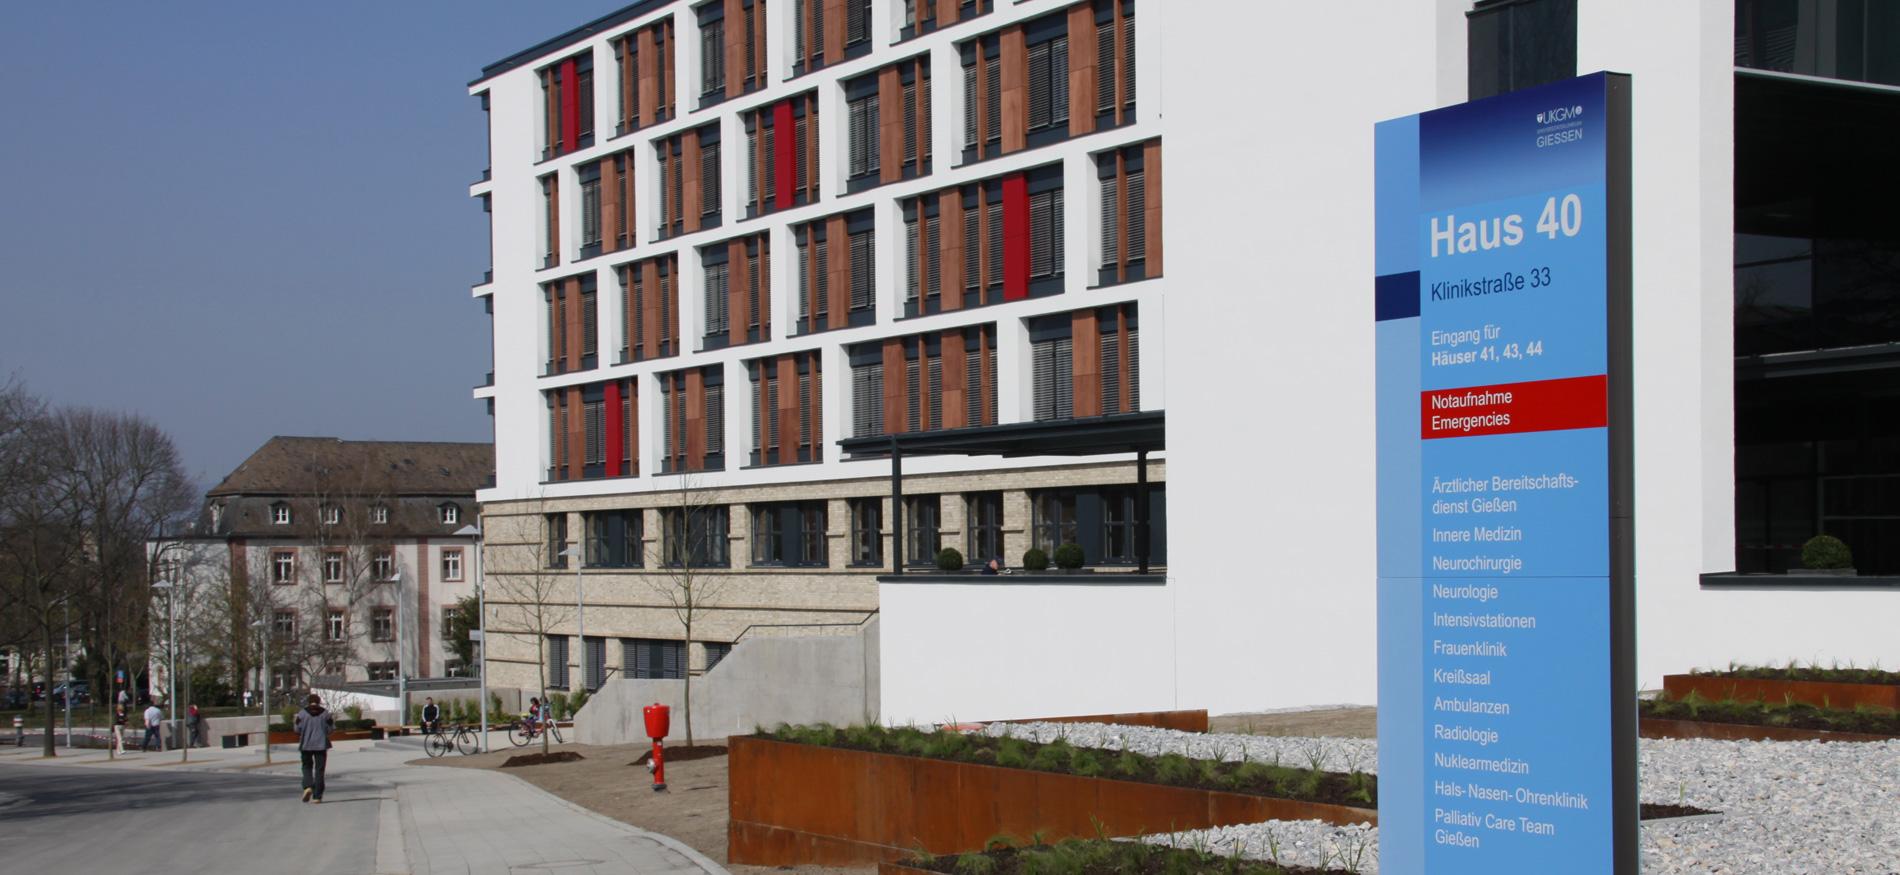 Leadway UKGM Universitätsklinikum Giessen Leitsystem